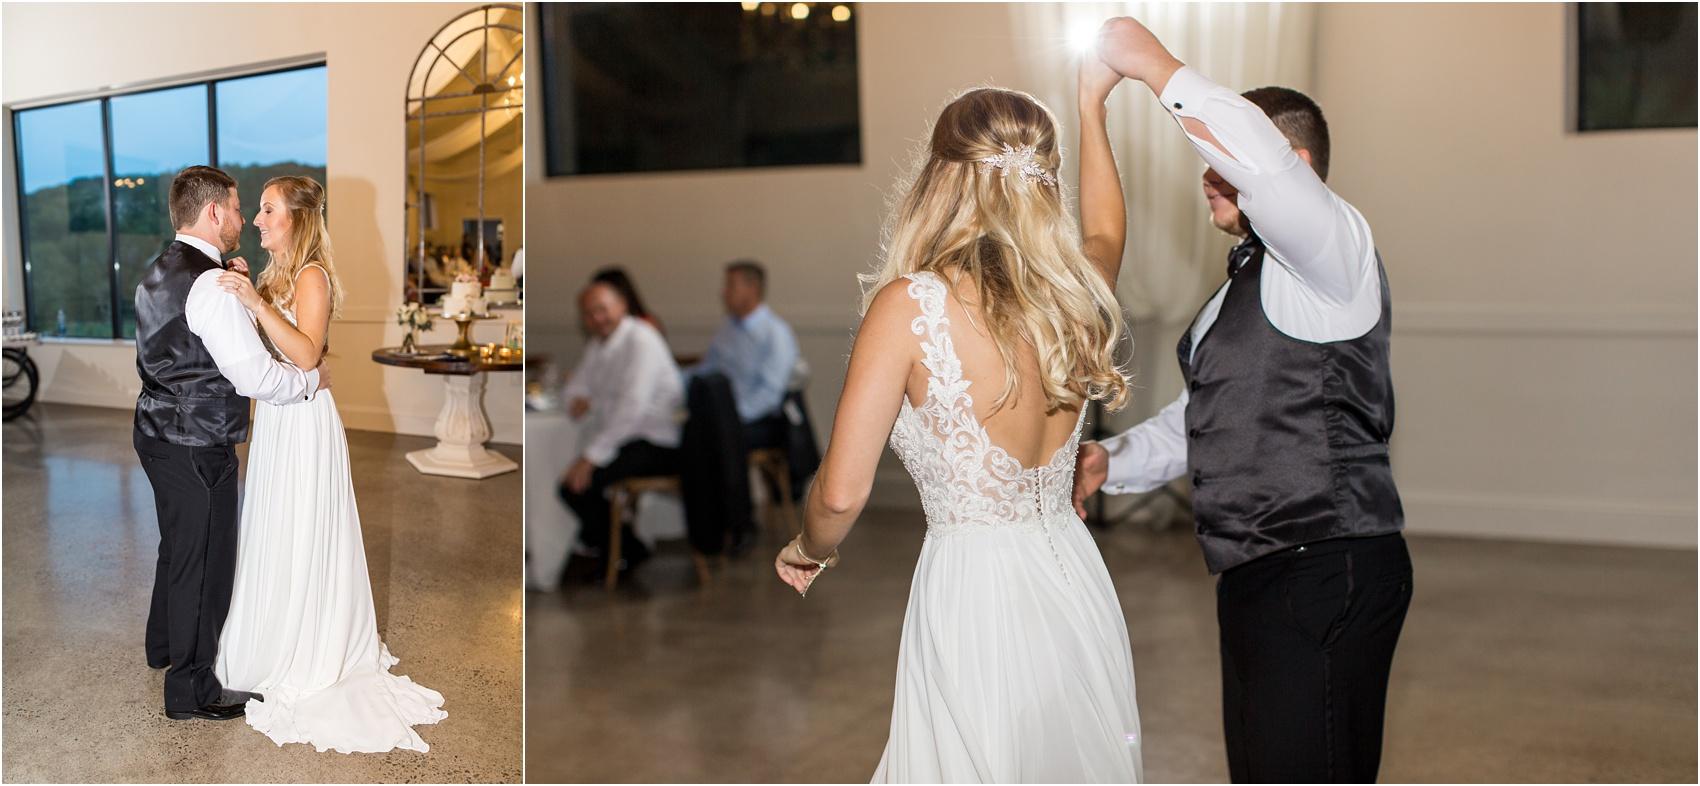 Savannah Eve Photography- Jurek-Woodworth Wedding- Sneak Peek-93.jpg